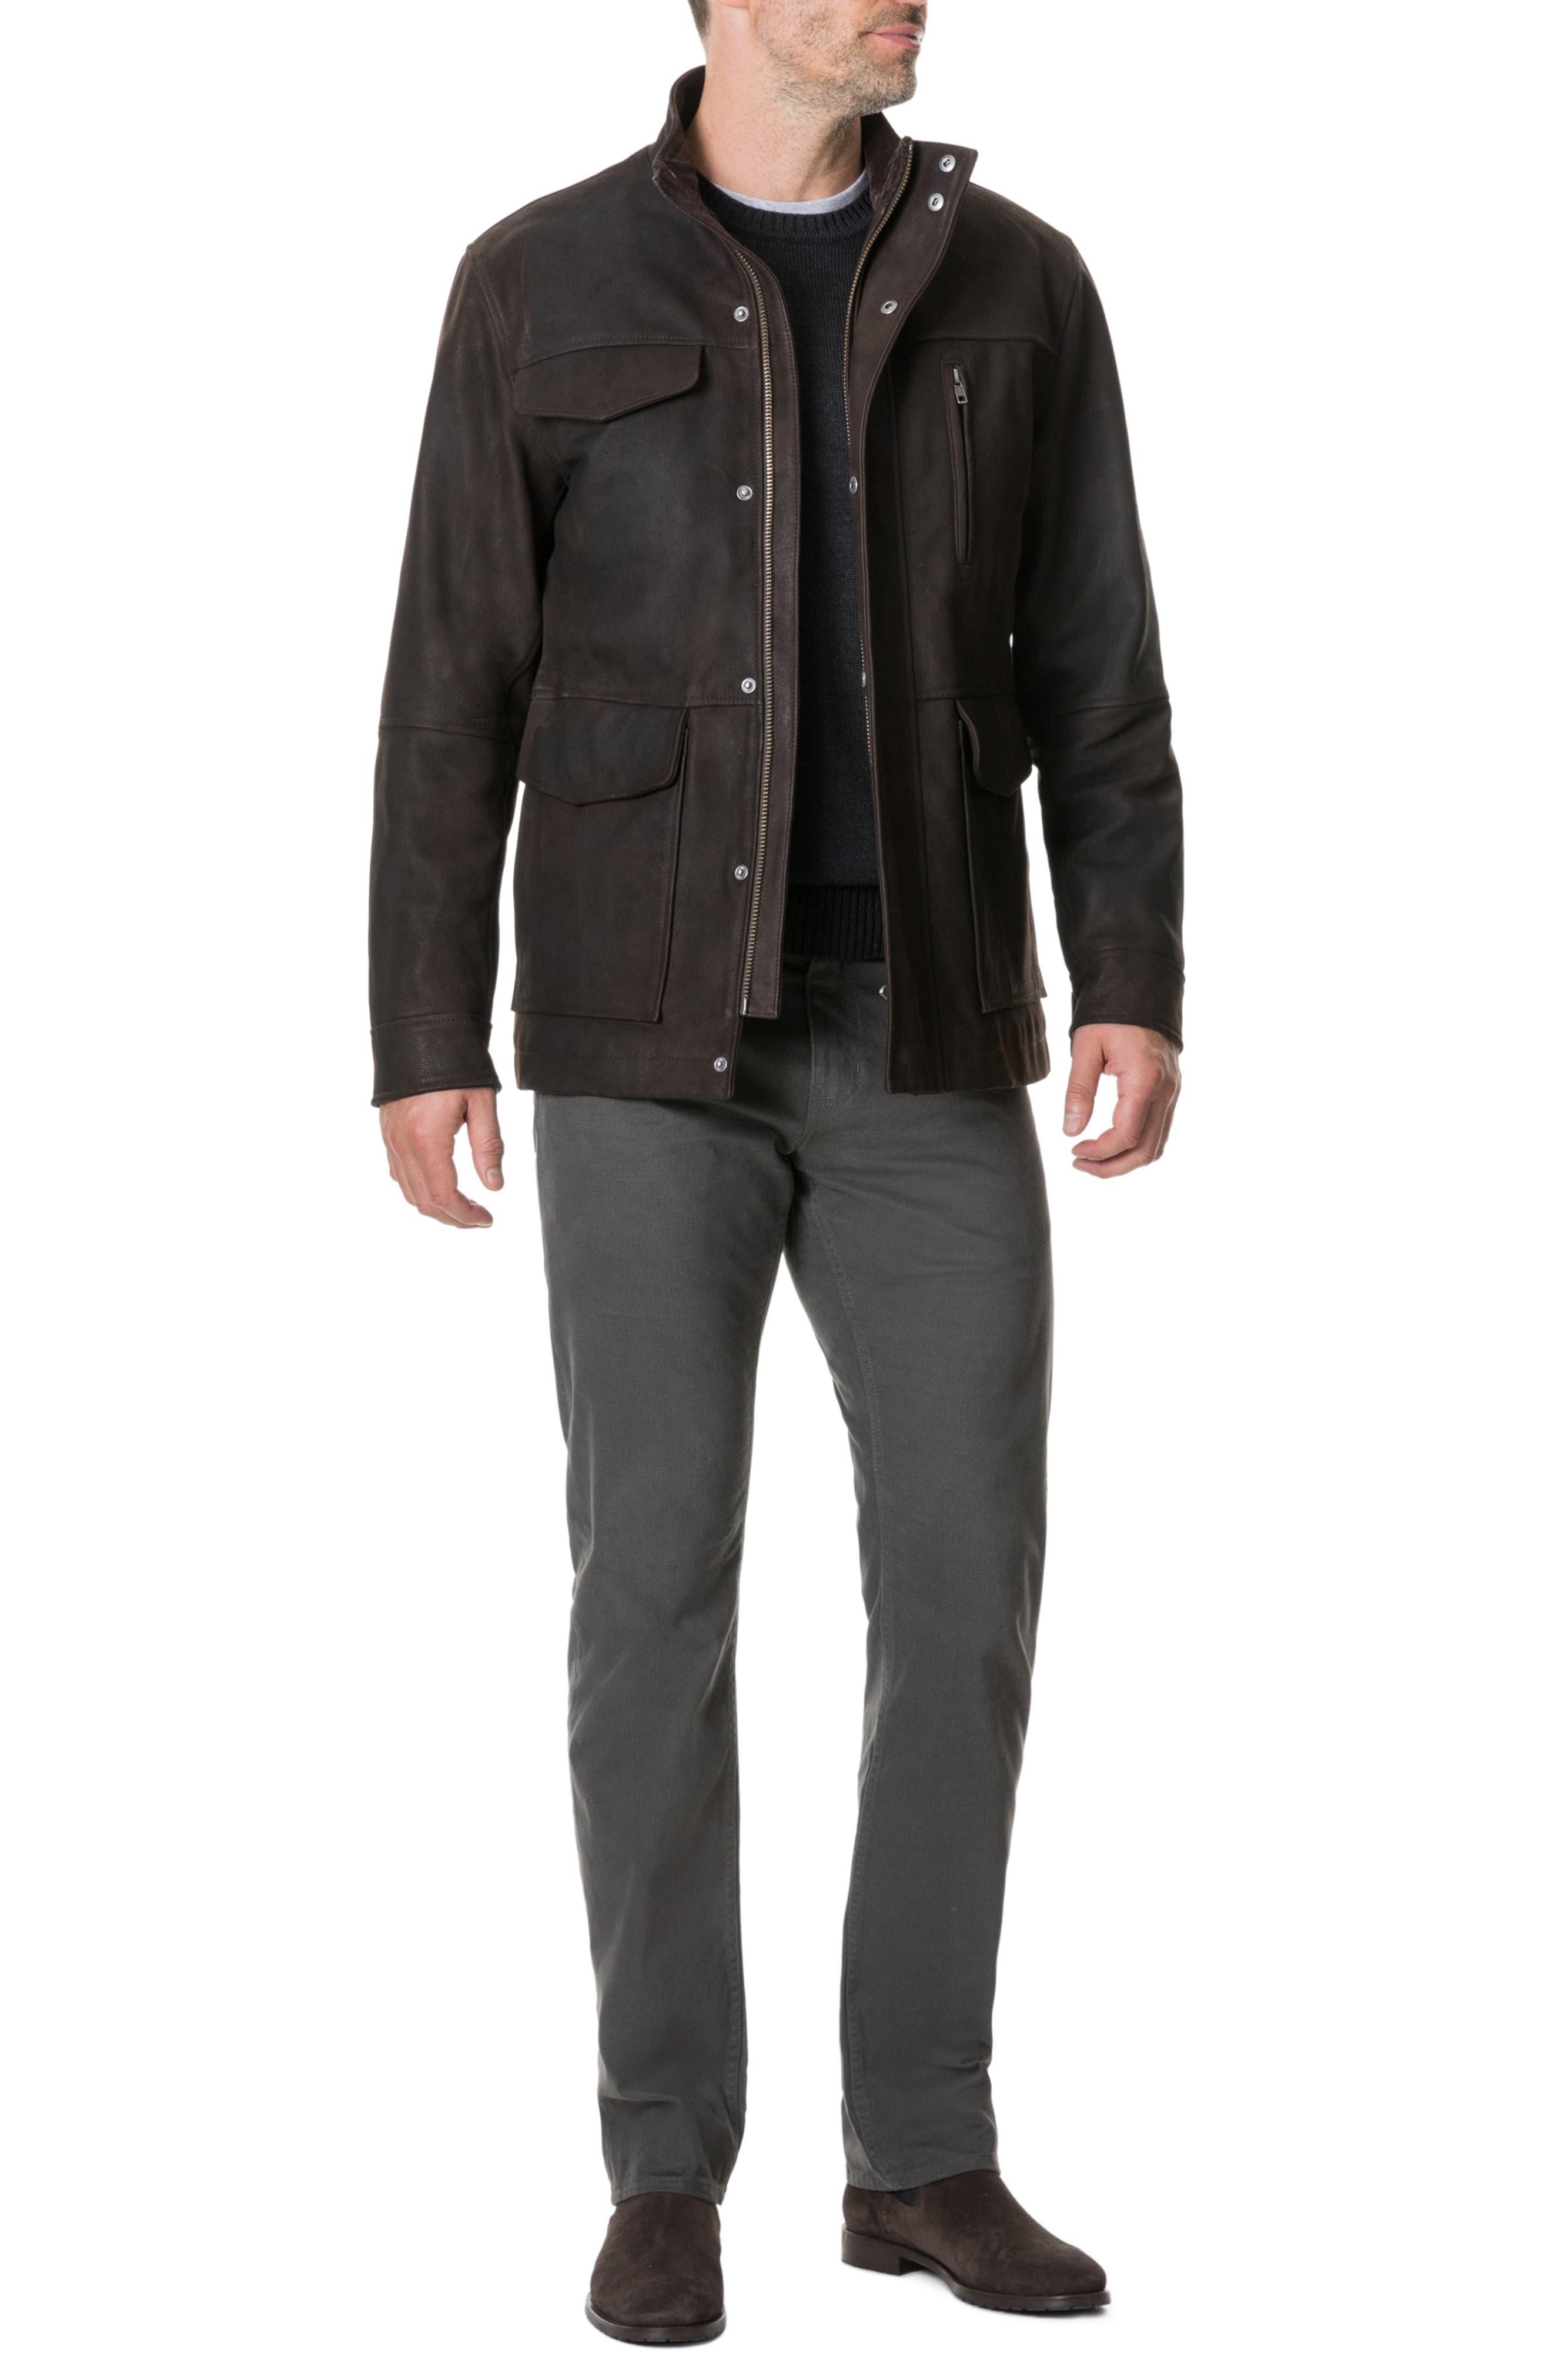 Fairholme Leather Jacket,                             Alternate thumbnail 6, color,                             CHOCOLATE